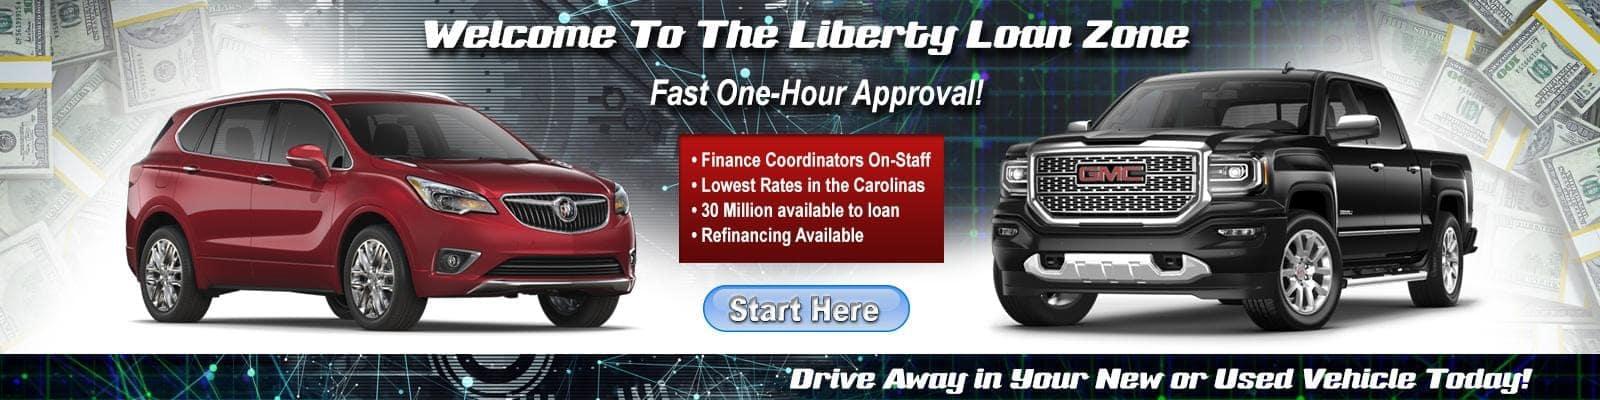 Liberty Loan Zone